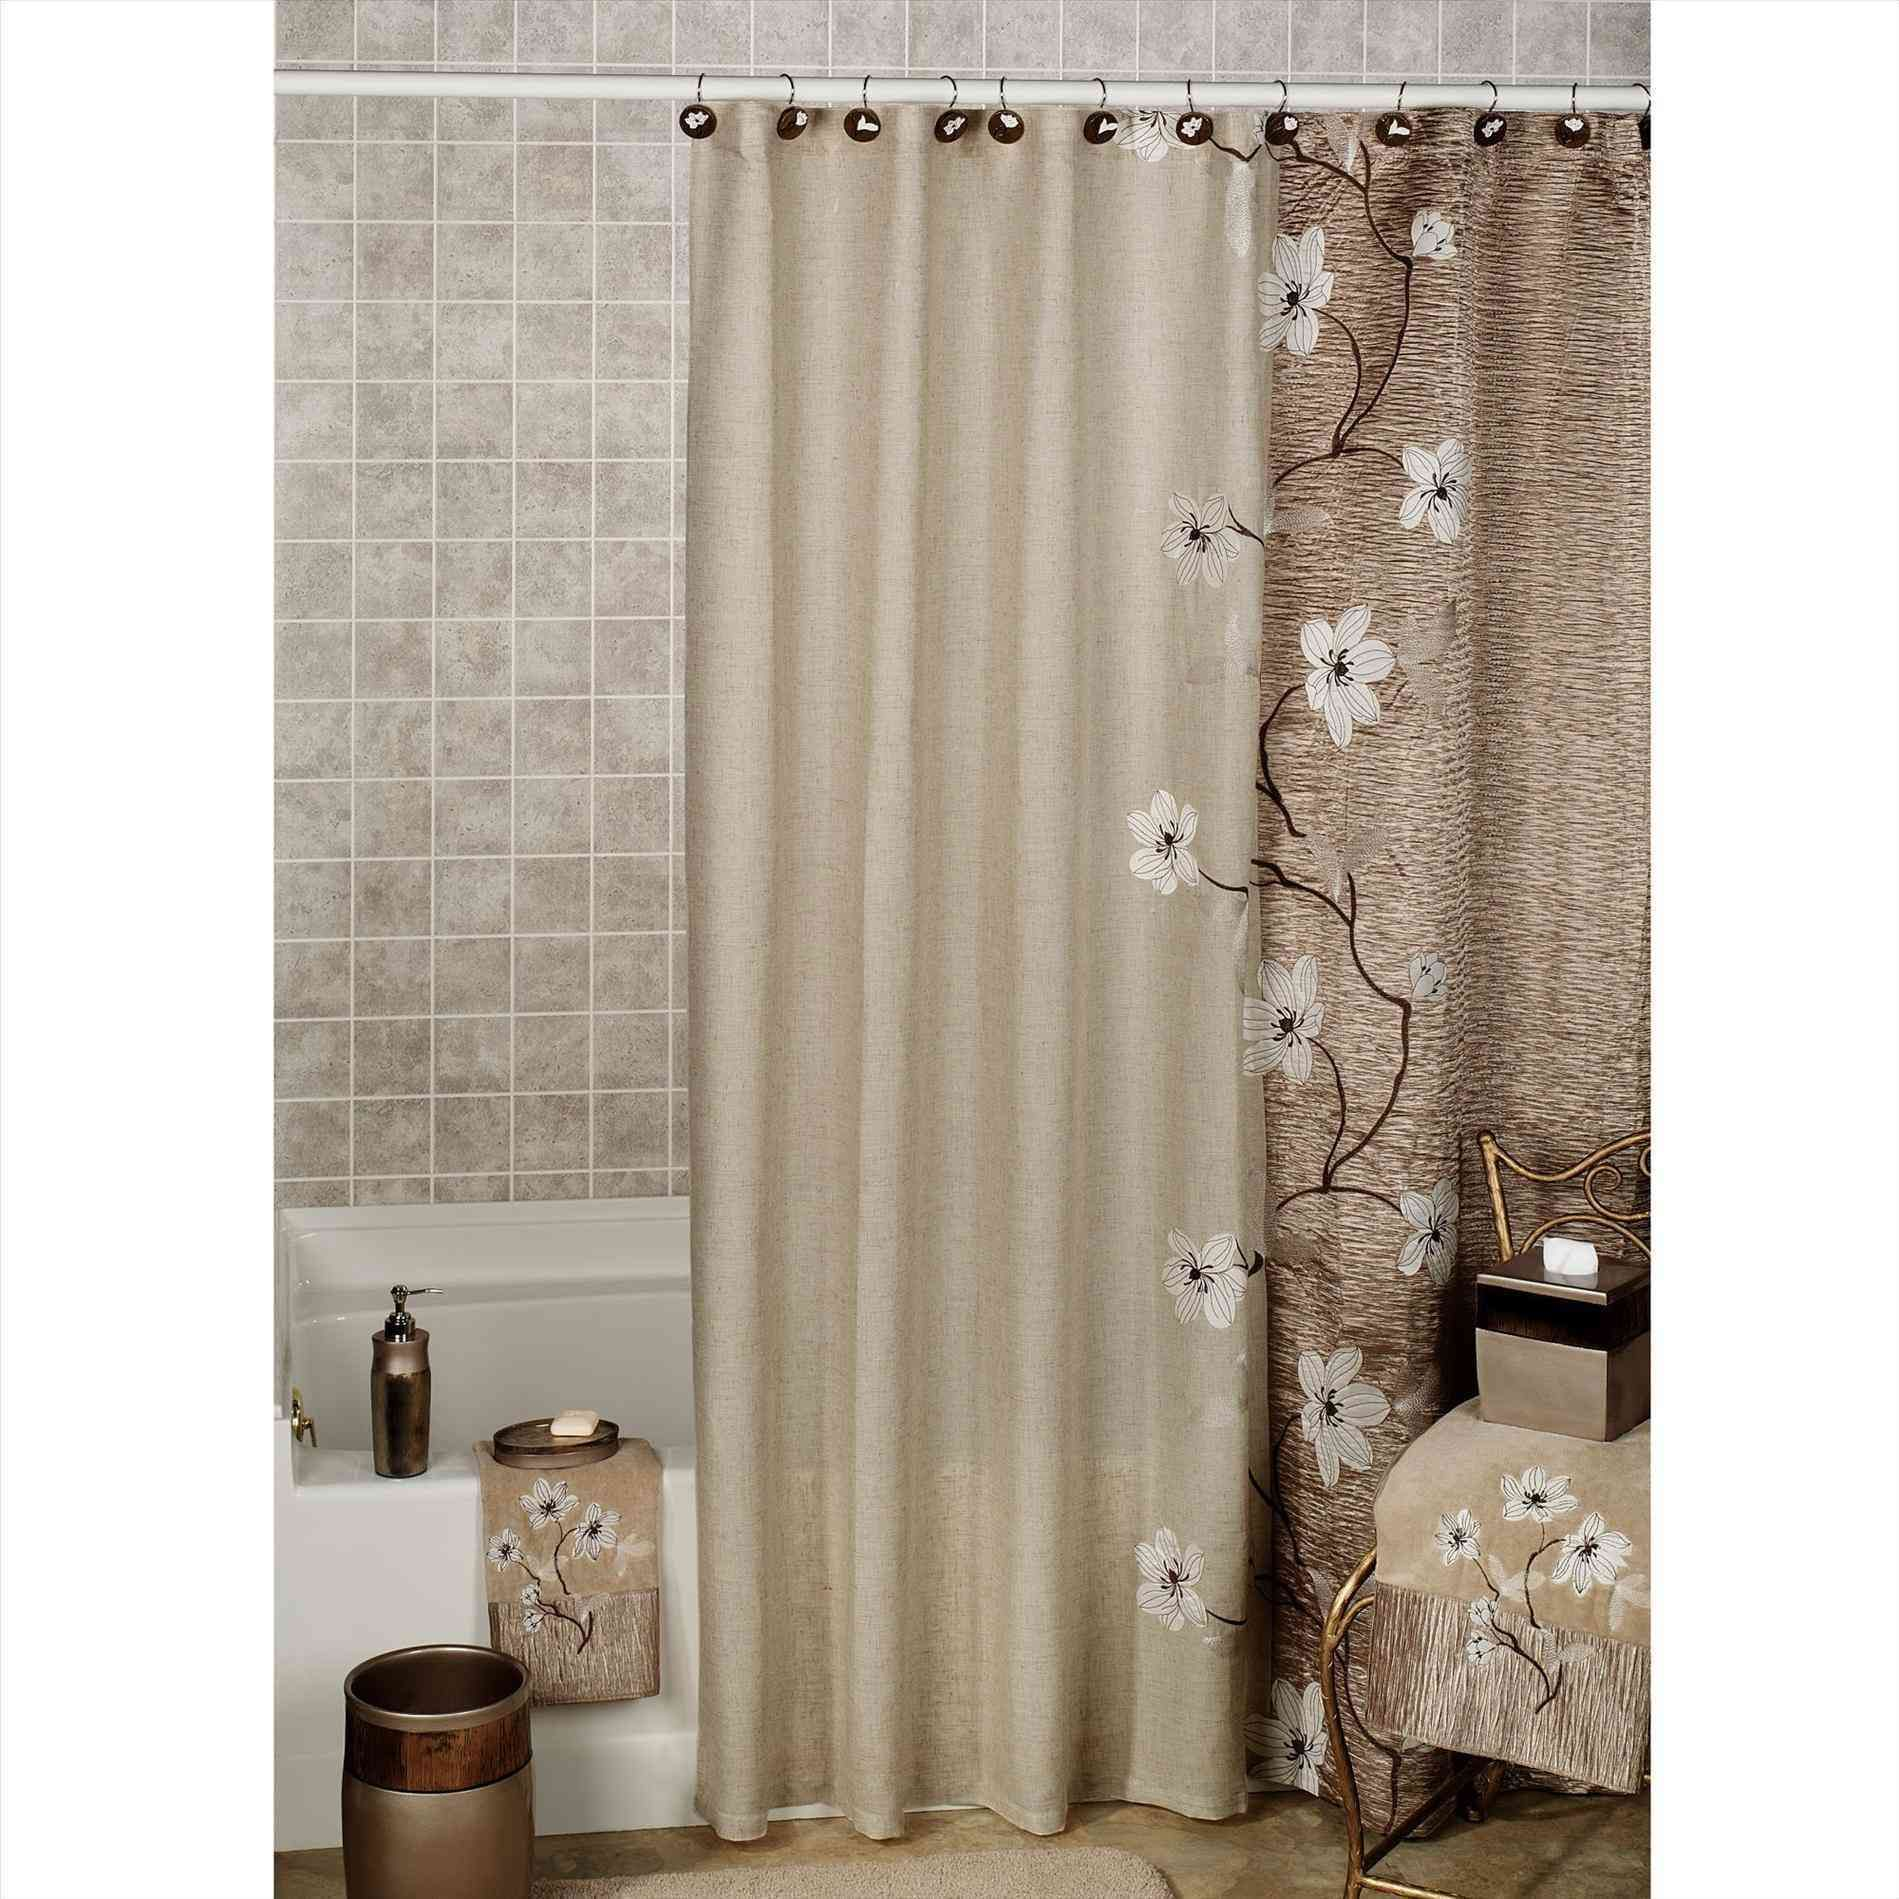 New Post Bathroom Rug And Shower Curtain Sets Elegant Shower